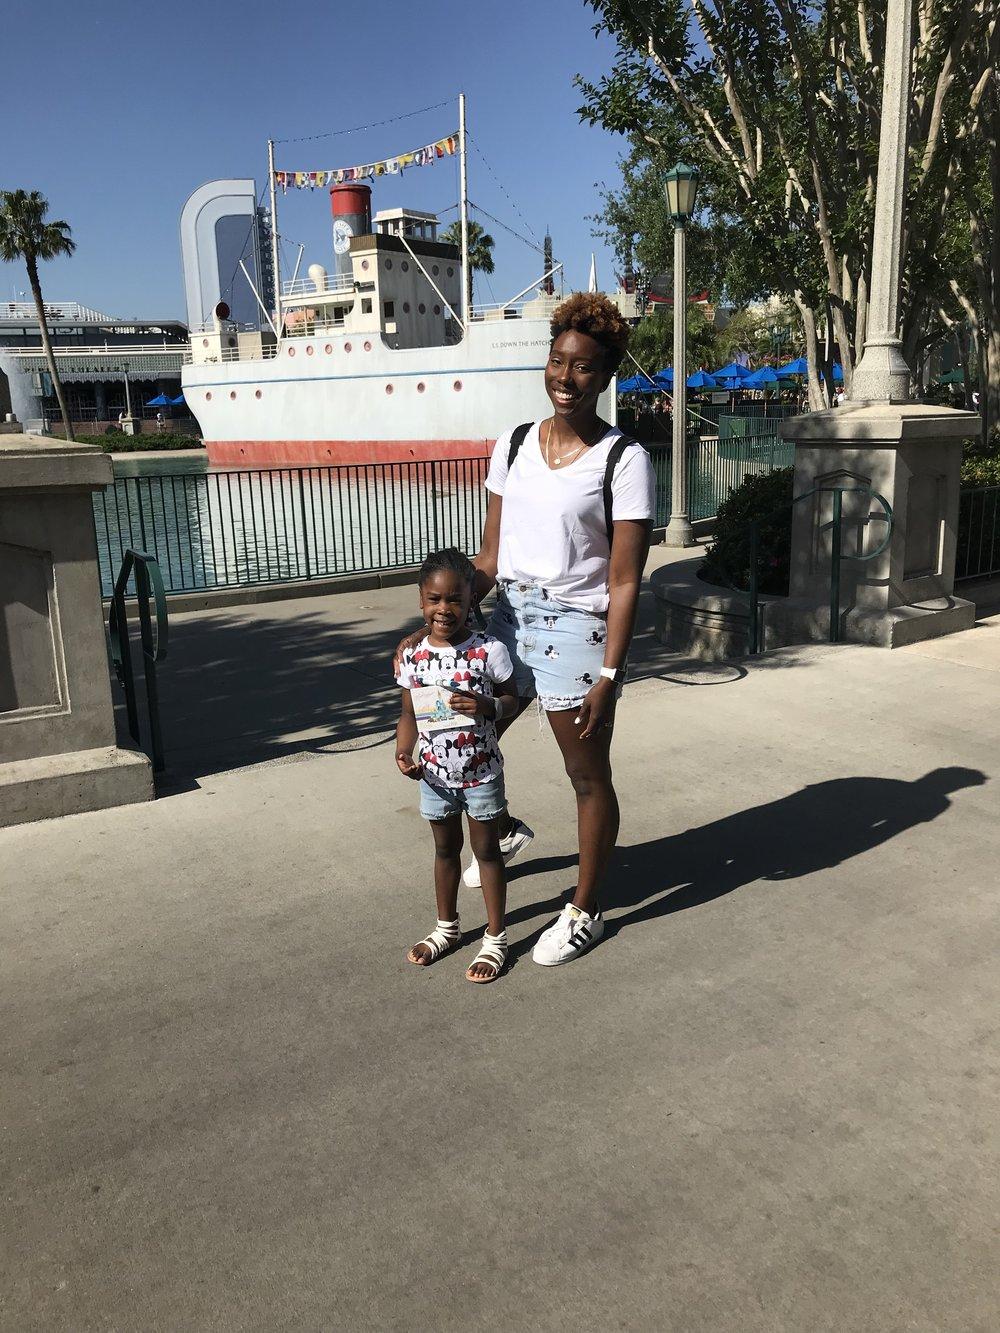 Disney-with-toddlers-magic-kingdom-10.jpg